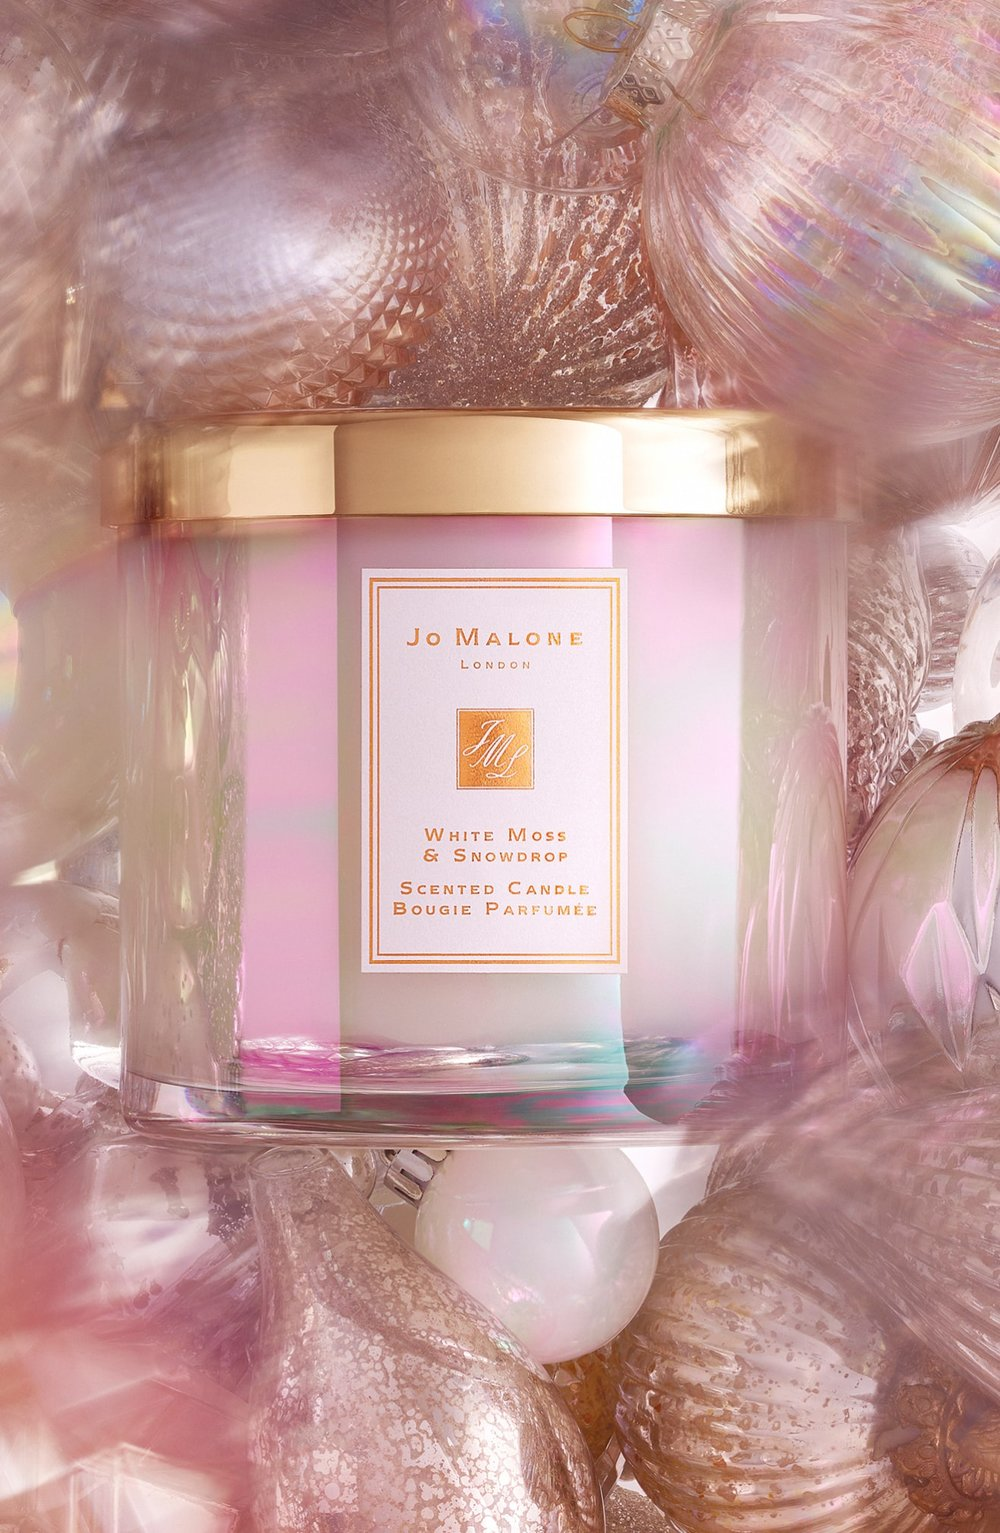 White Moss & Snowdrop Deluxe Candle van Jo Malone (€ 158,00/600 g).    O.a. verkrijgbaar bij Senteurs d'Ailleurs in Brussel en op de luchthaven van Zaventem.